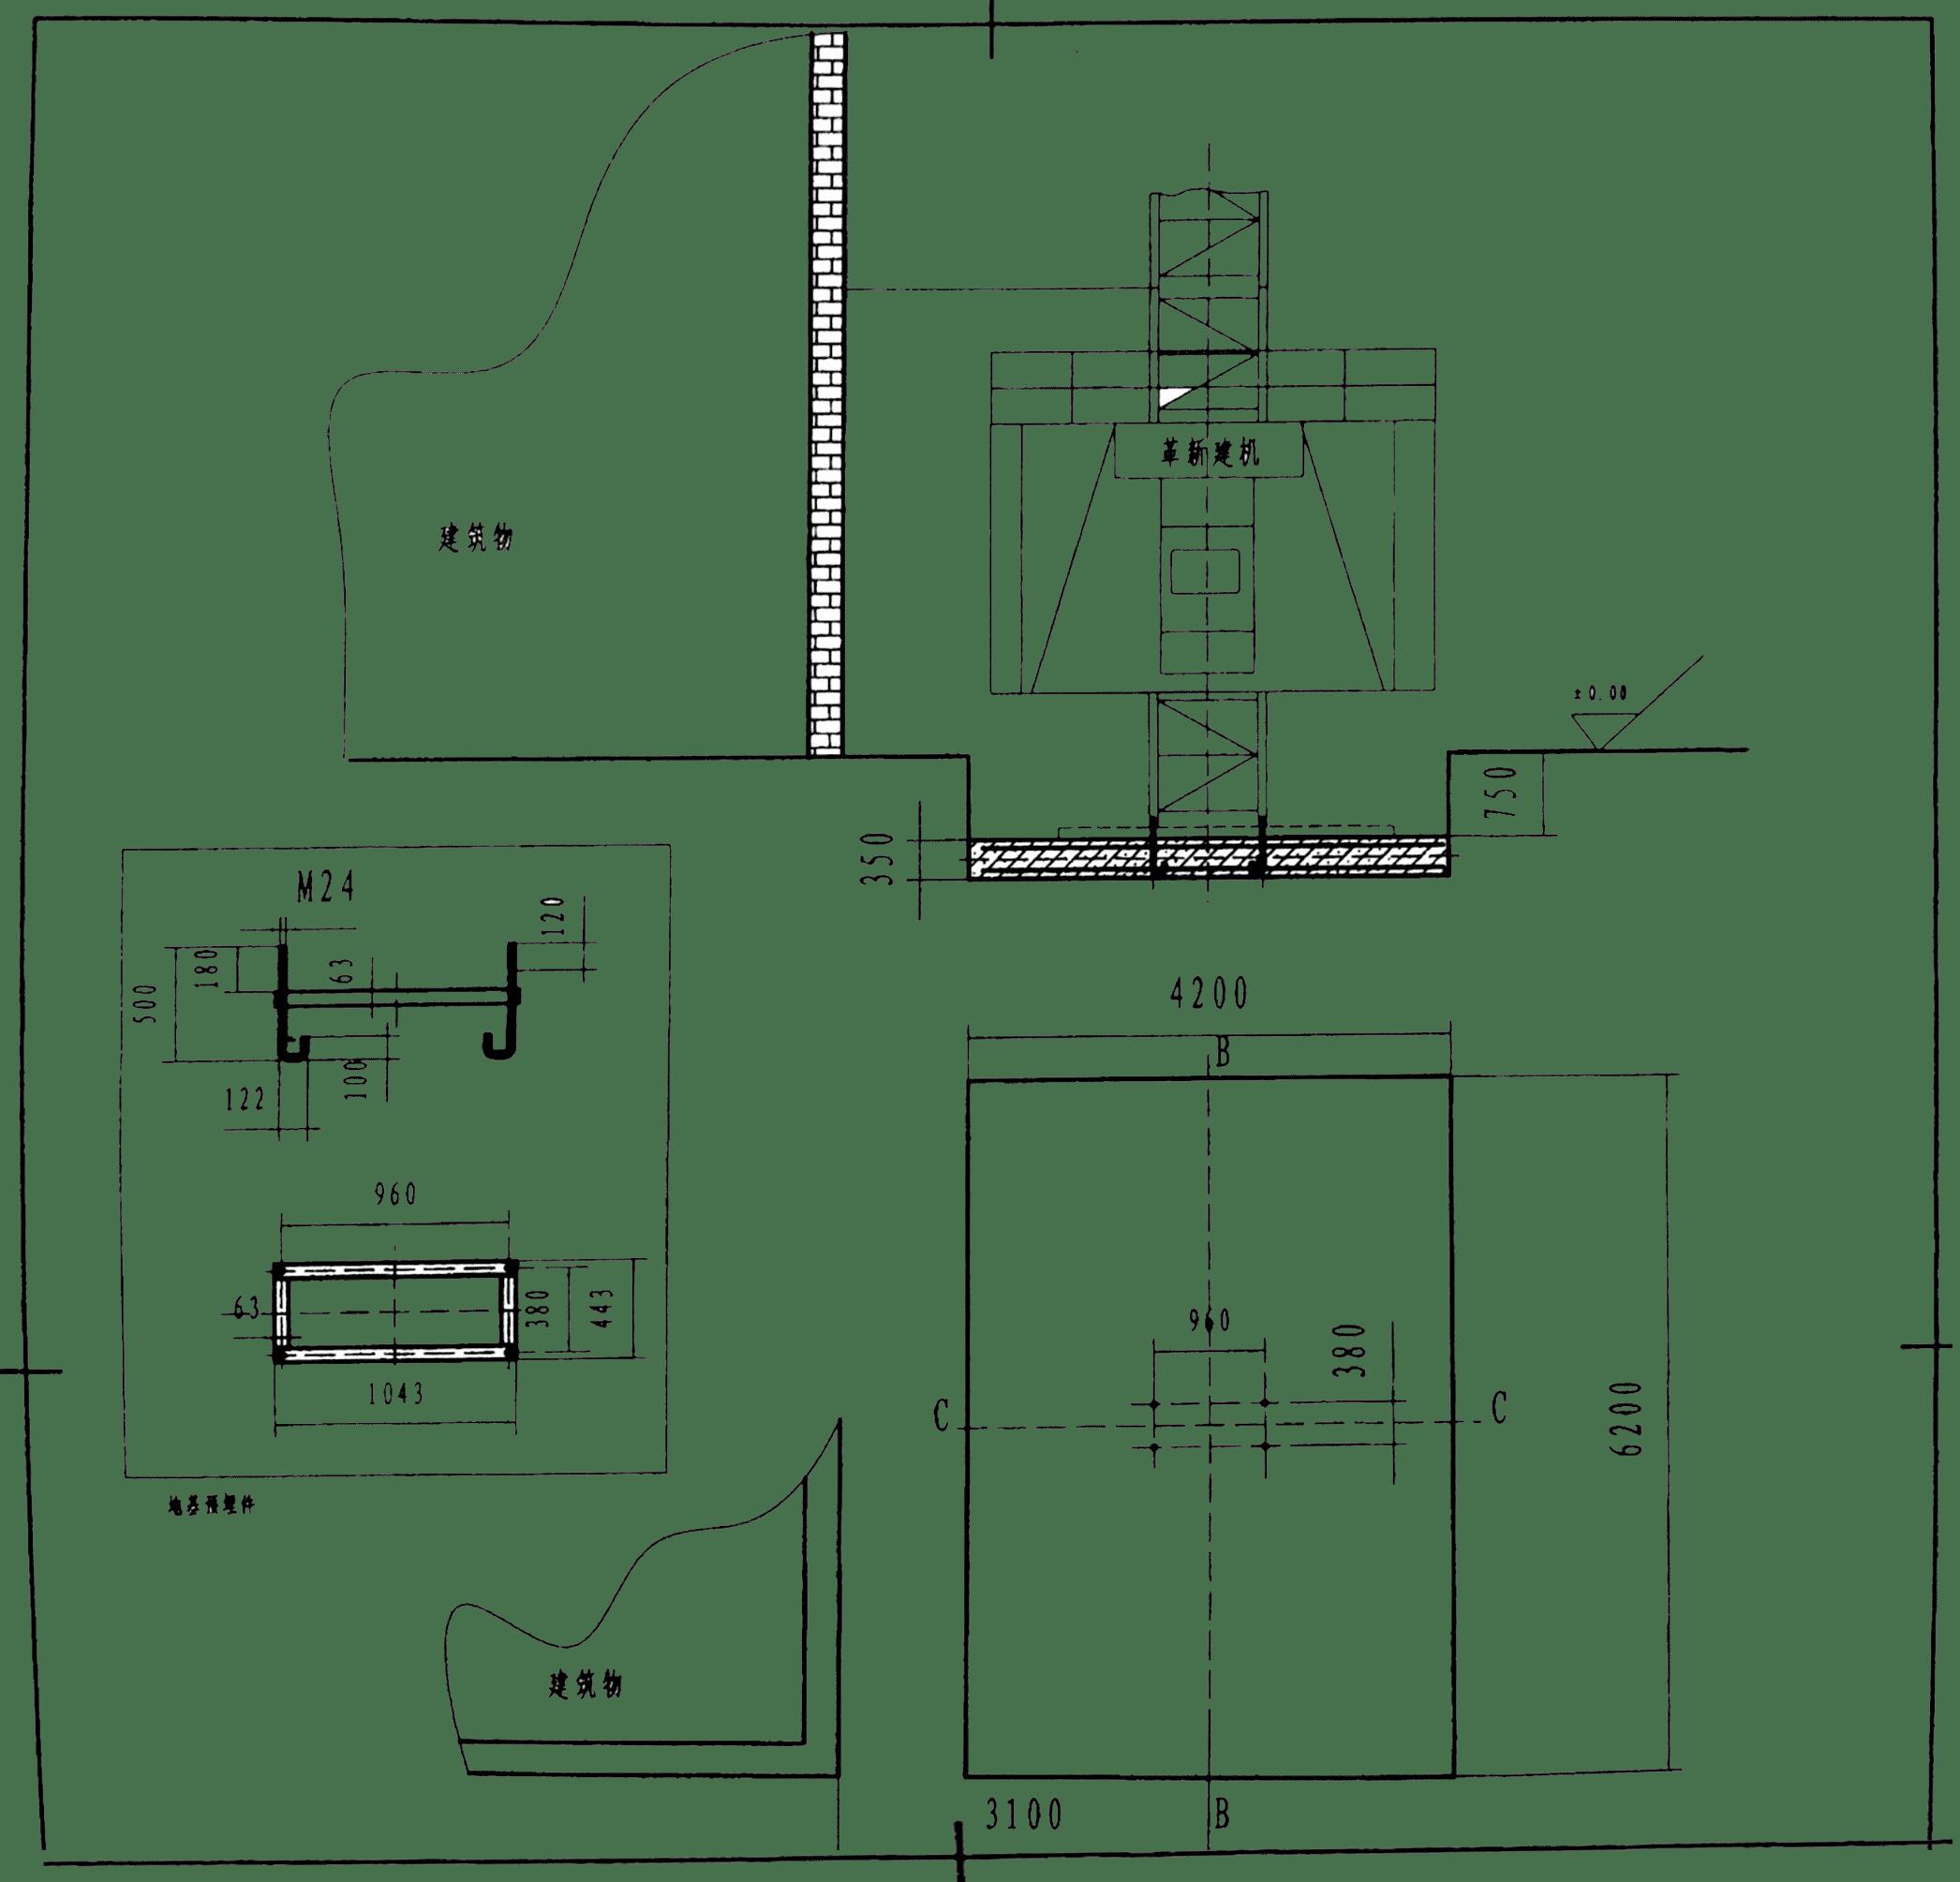 sc200施工升降机基础图纸(安装基础图)